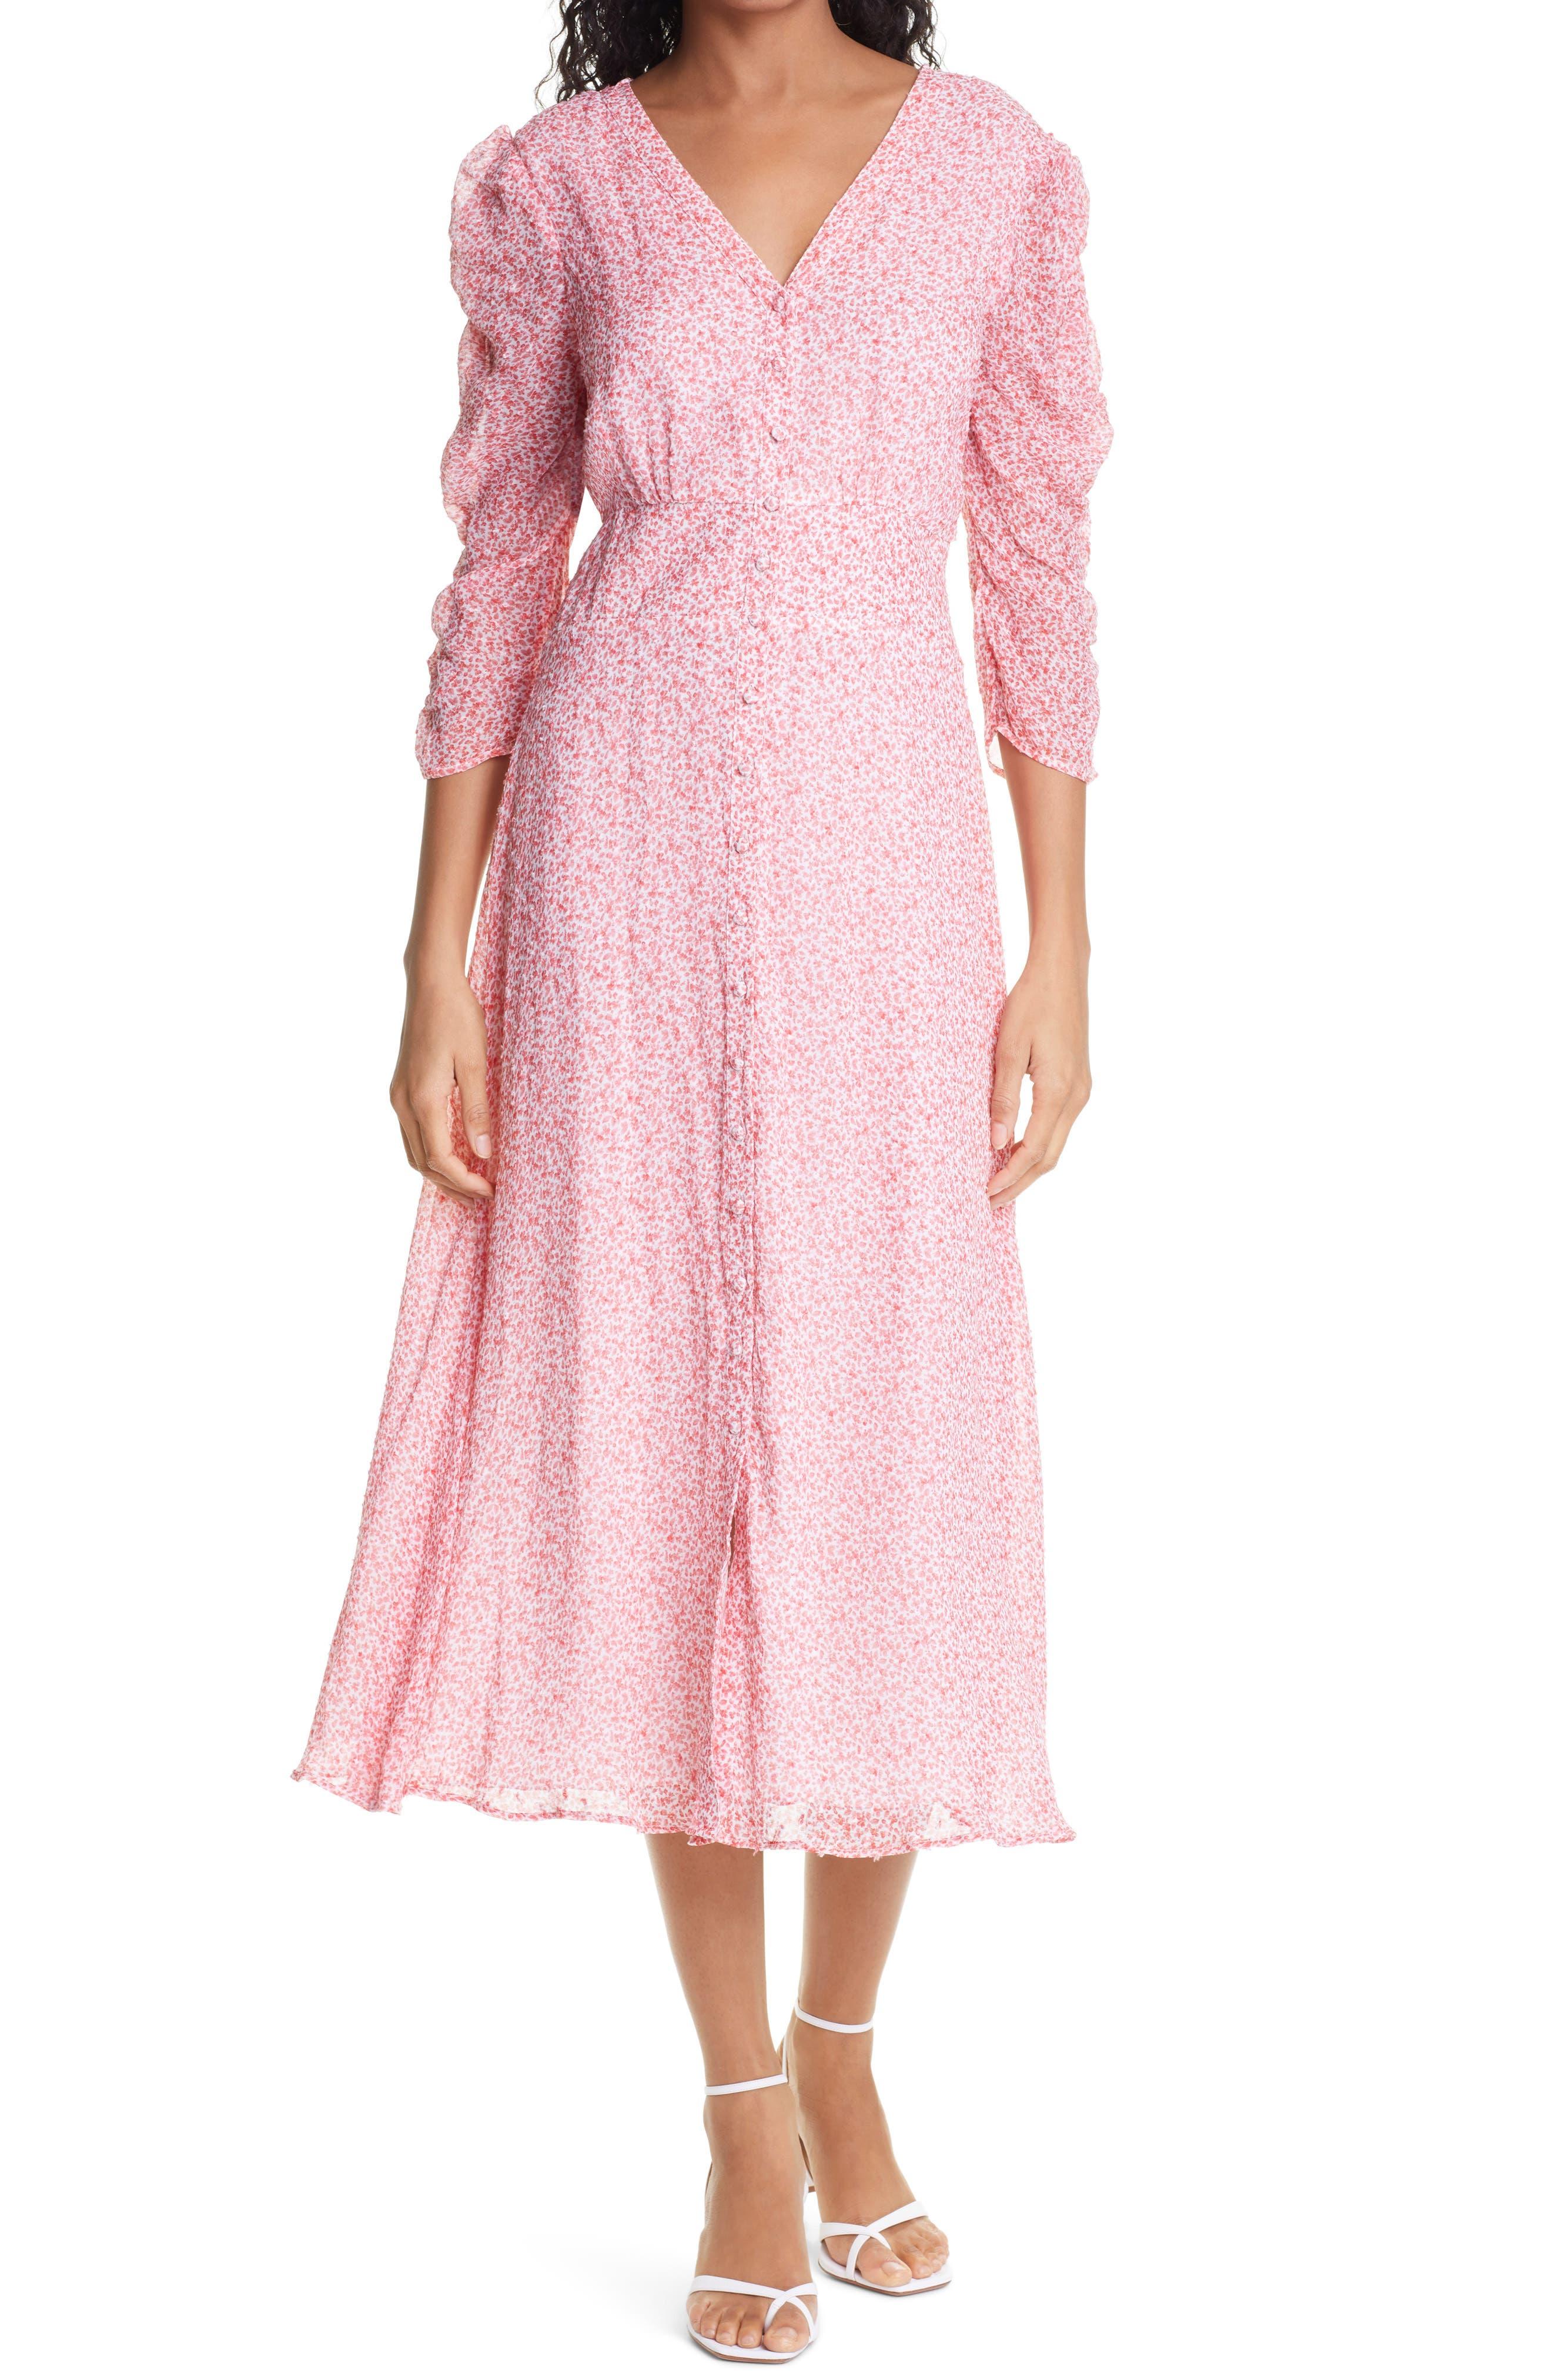 Ditsy Floral Dobby Chiffon Midi Dress